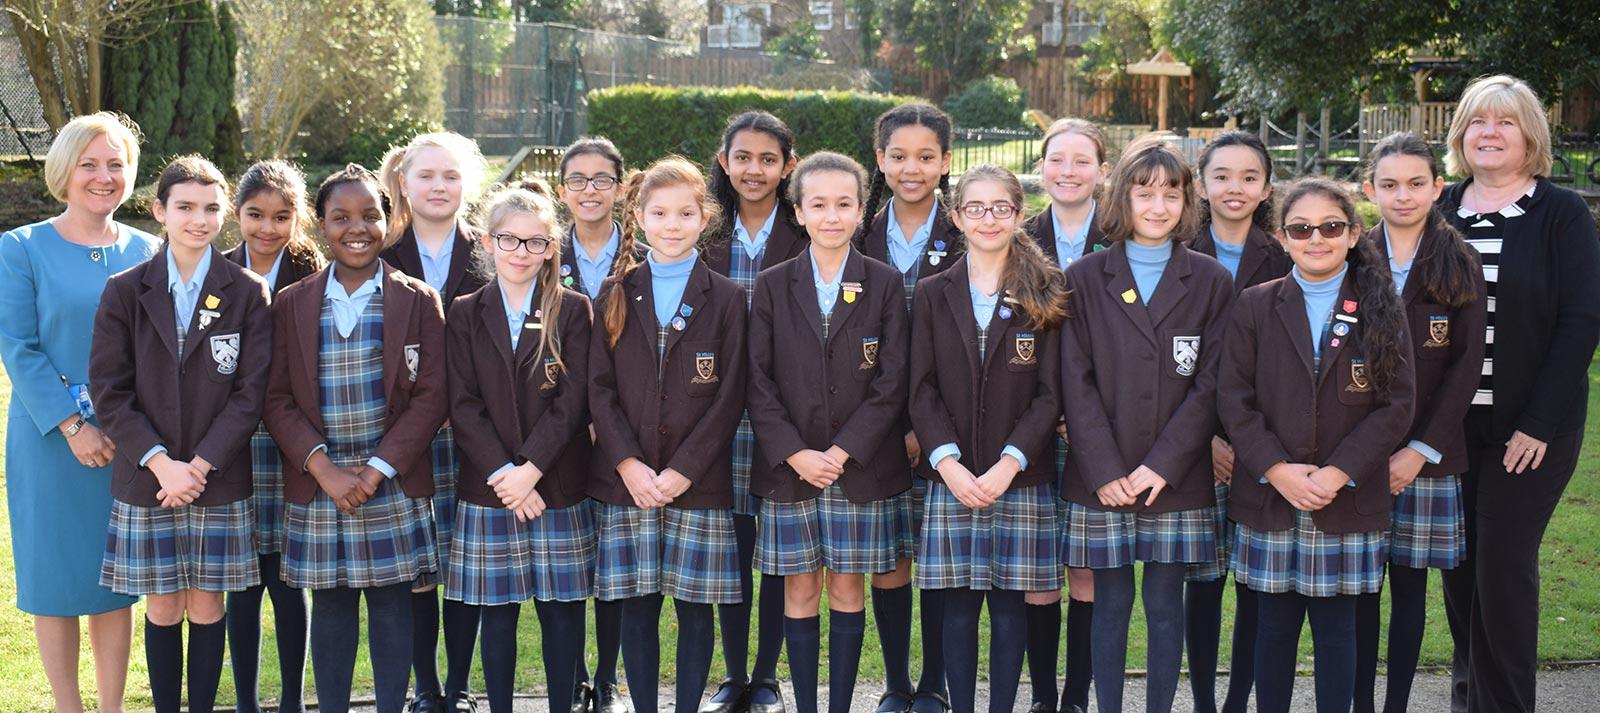 St Hilda S Prep School For Girls